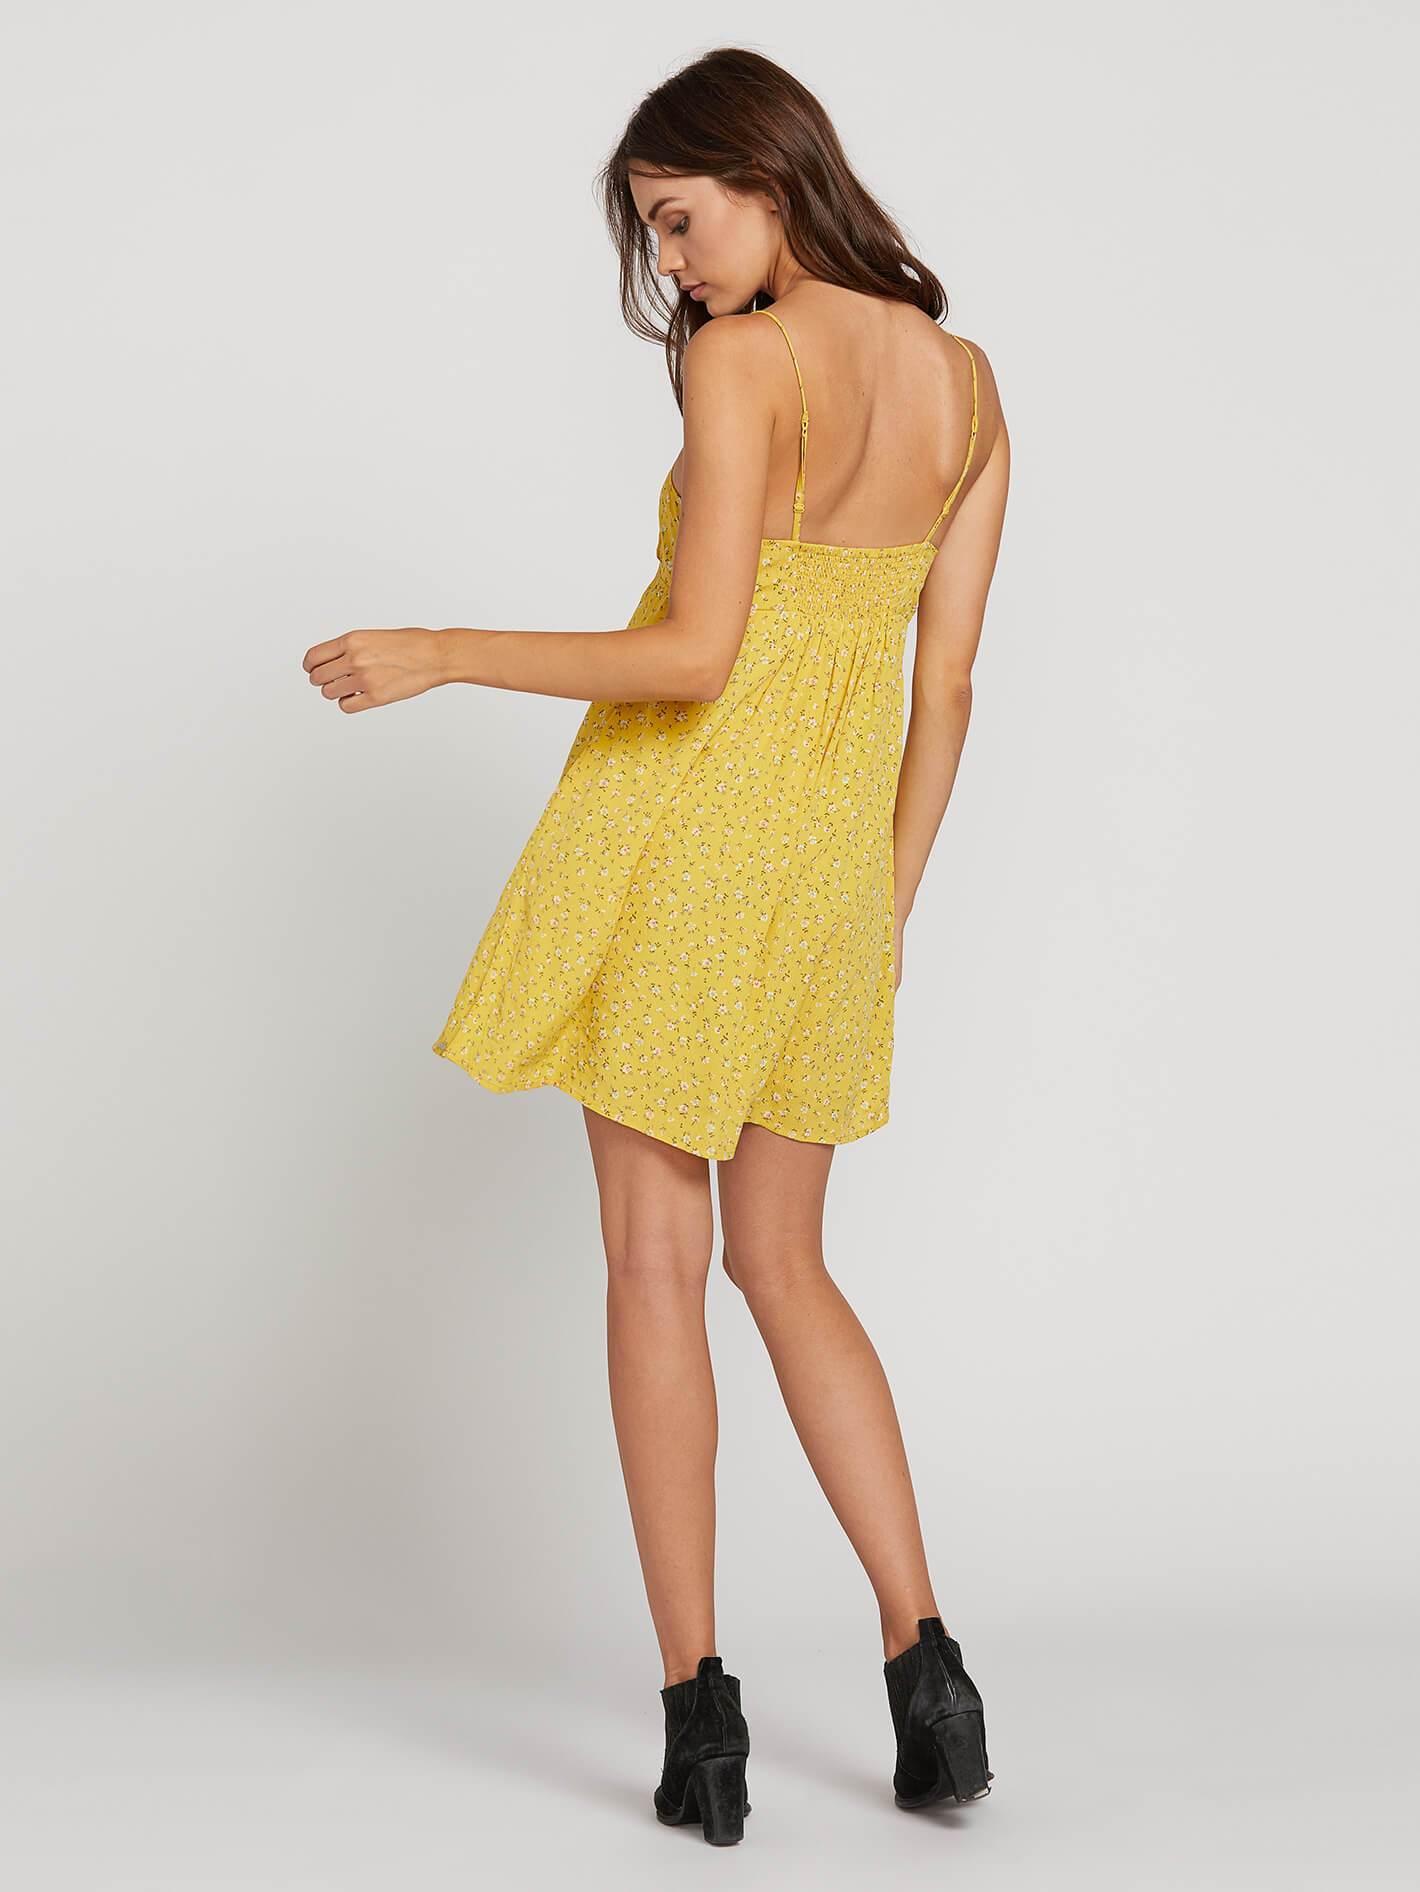 67842e0eeecf Volcom Hey Bud Cami Dress in Yellow - Lyst